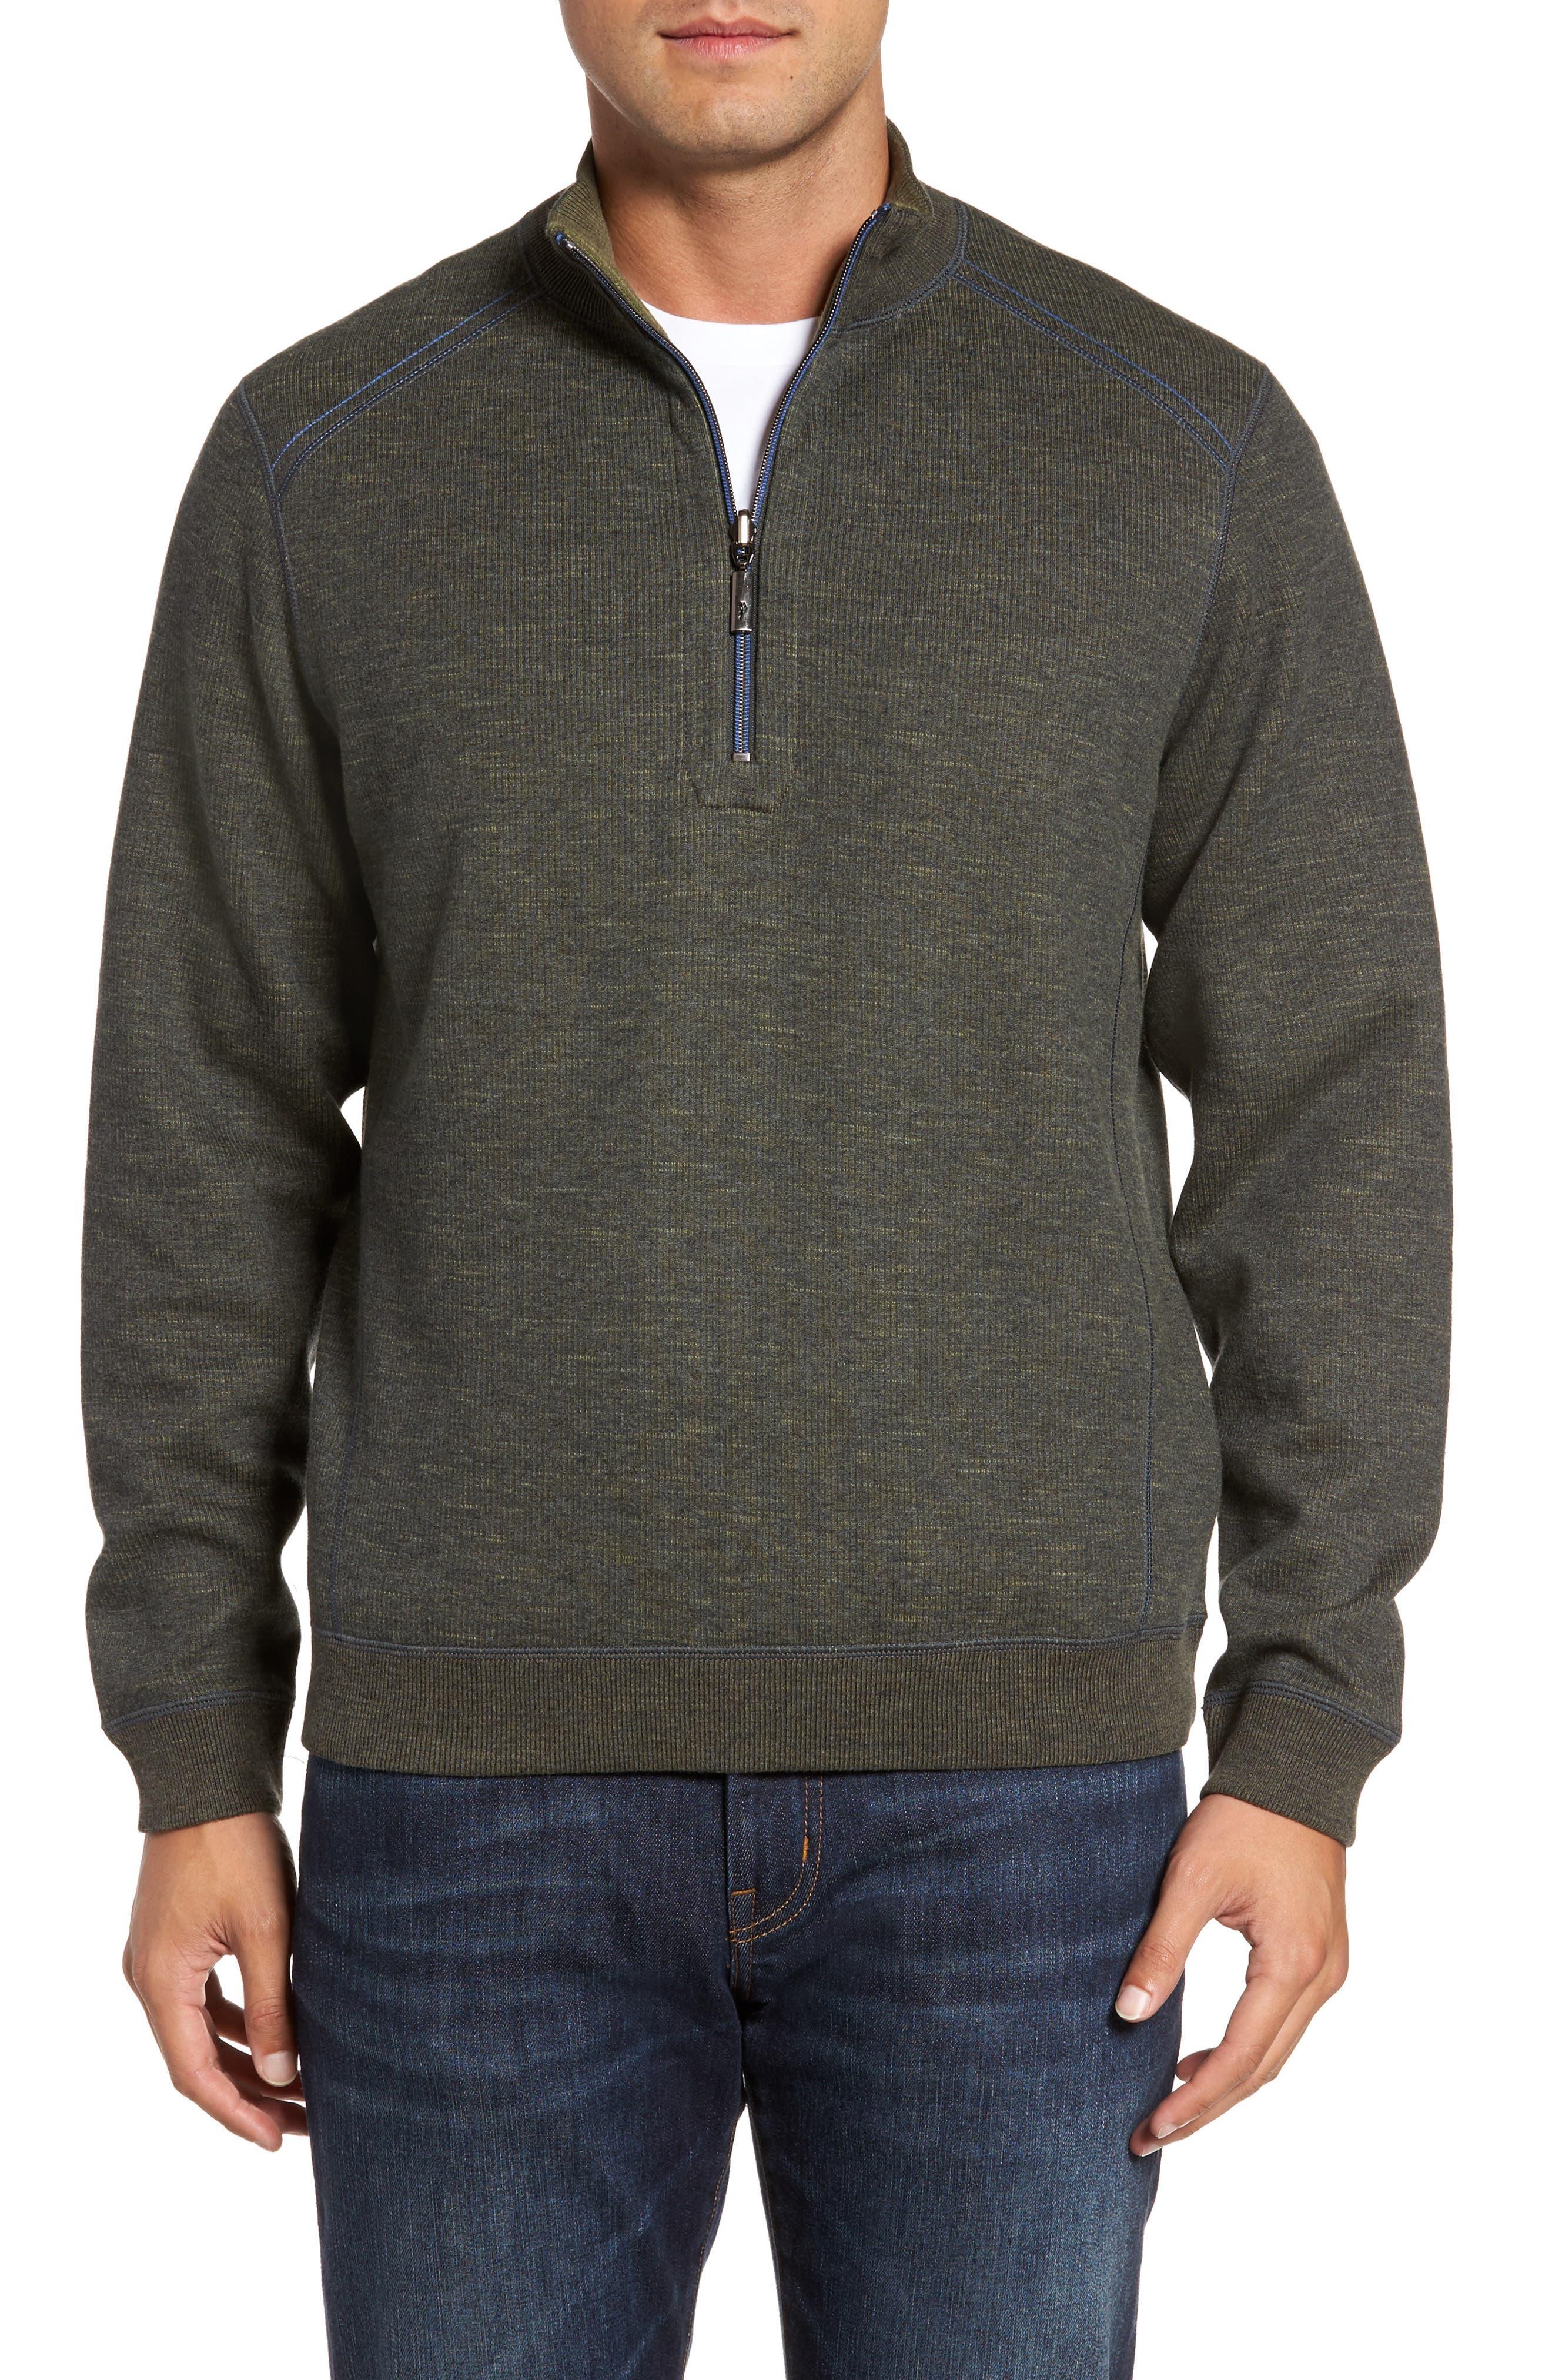 Flipsider Reversible Quarter-Zip Pullover,                             Main thumbnail 1, color,                             Steel Wool Heather